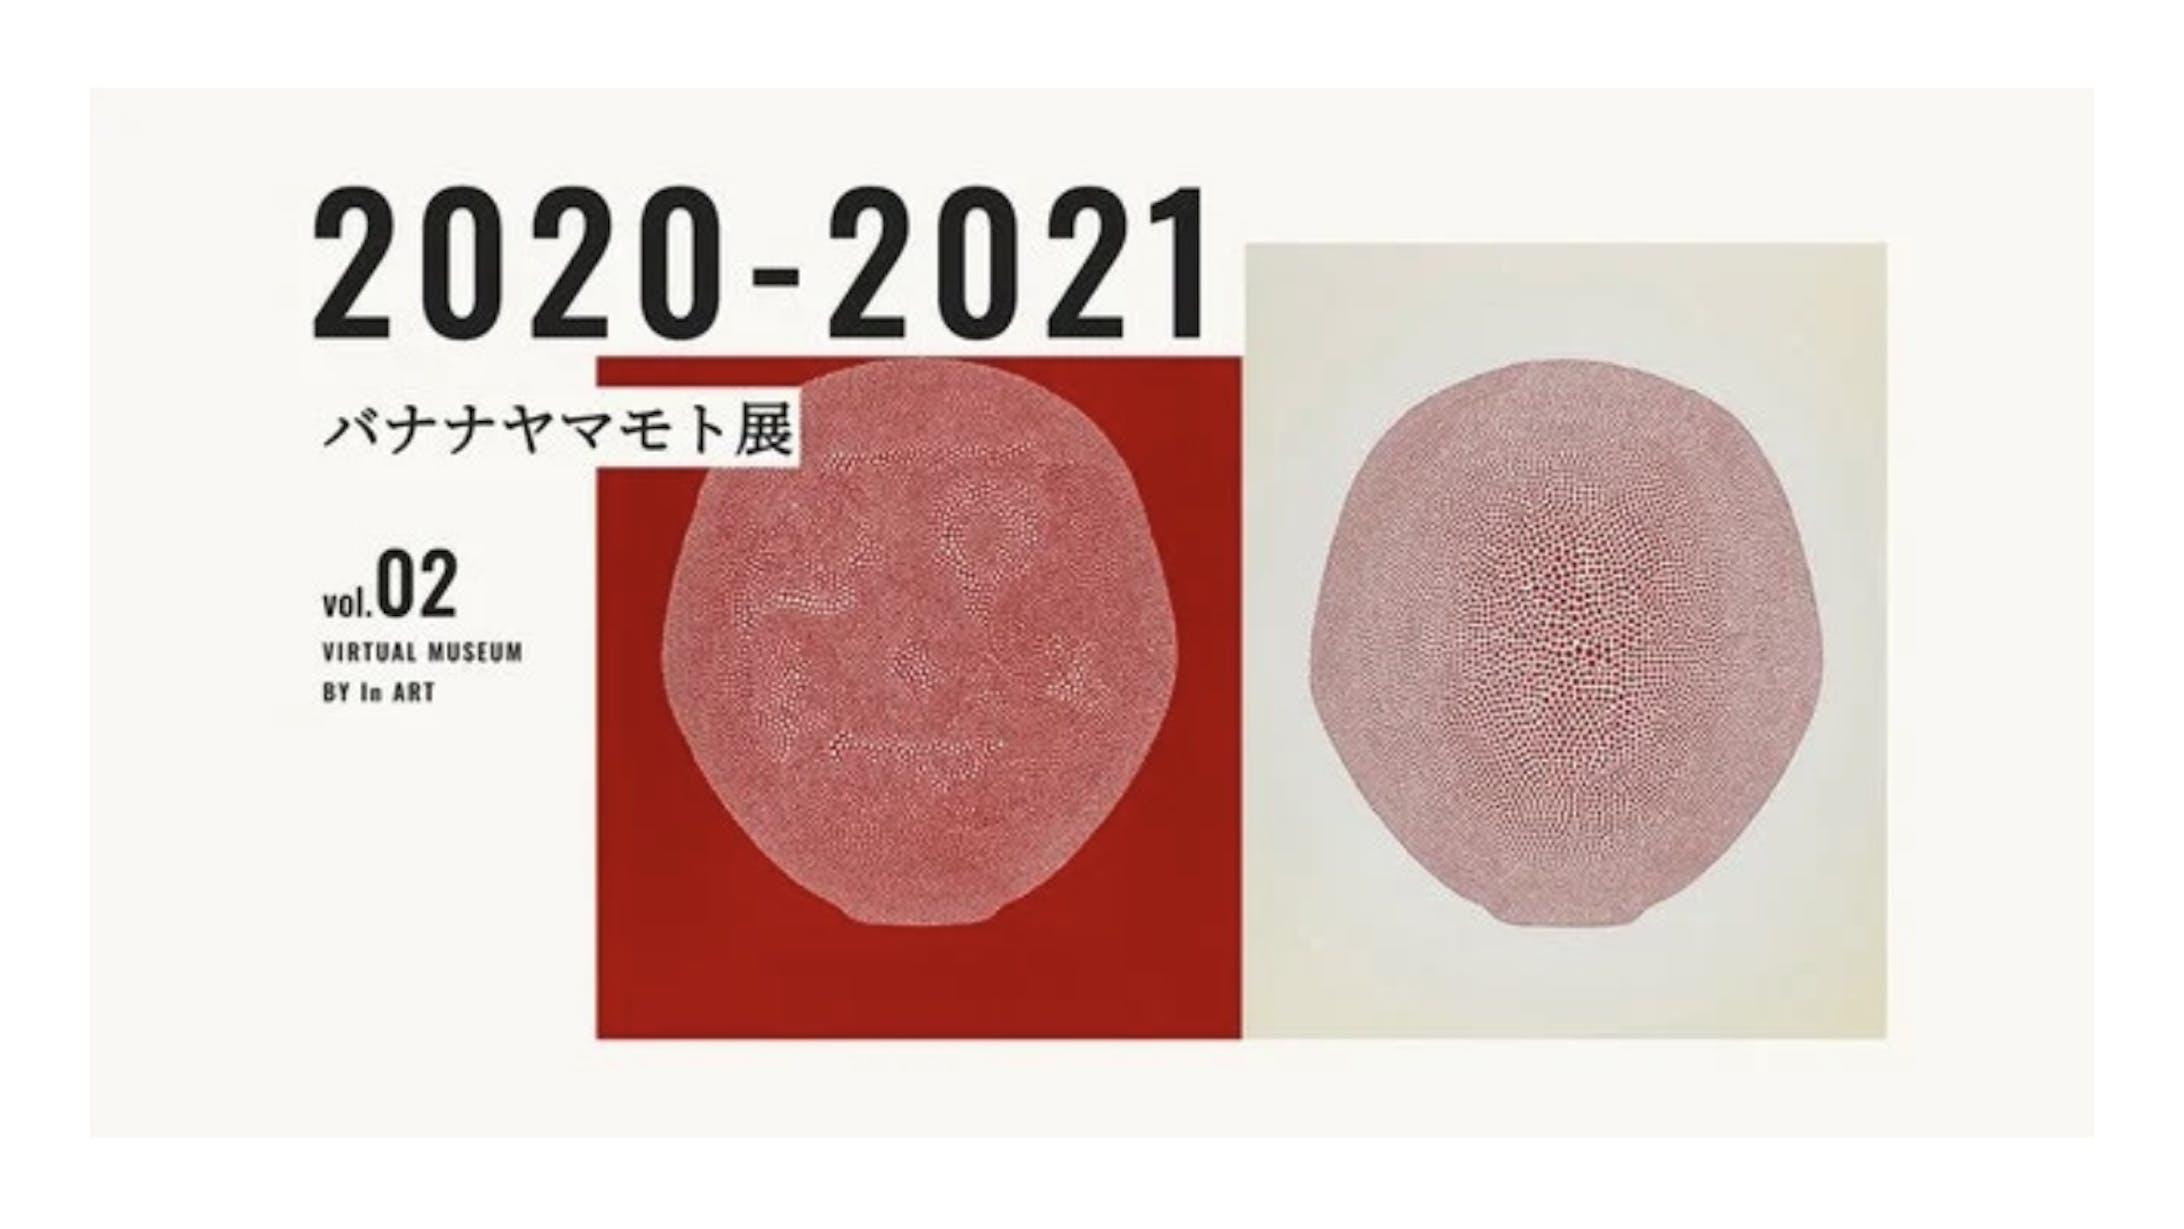 bananayamamoto展 2020-2021-1